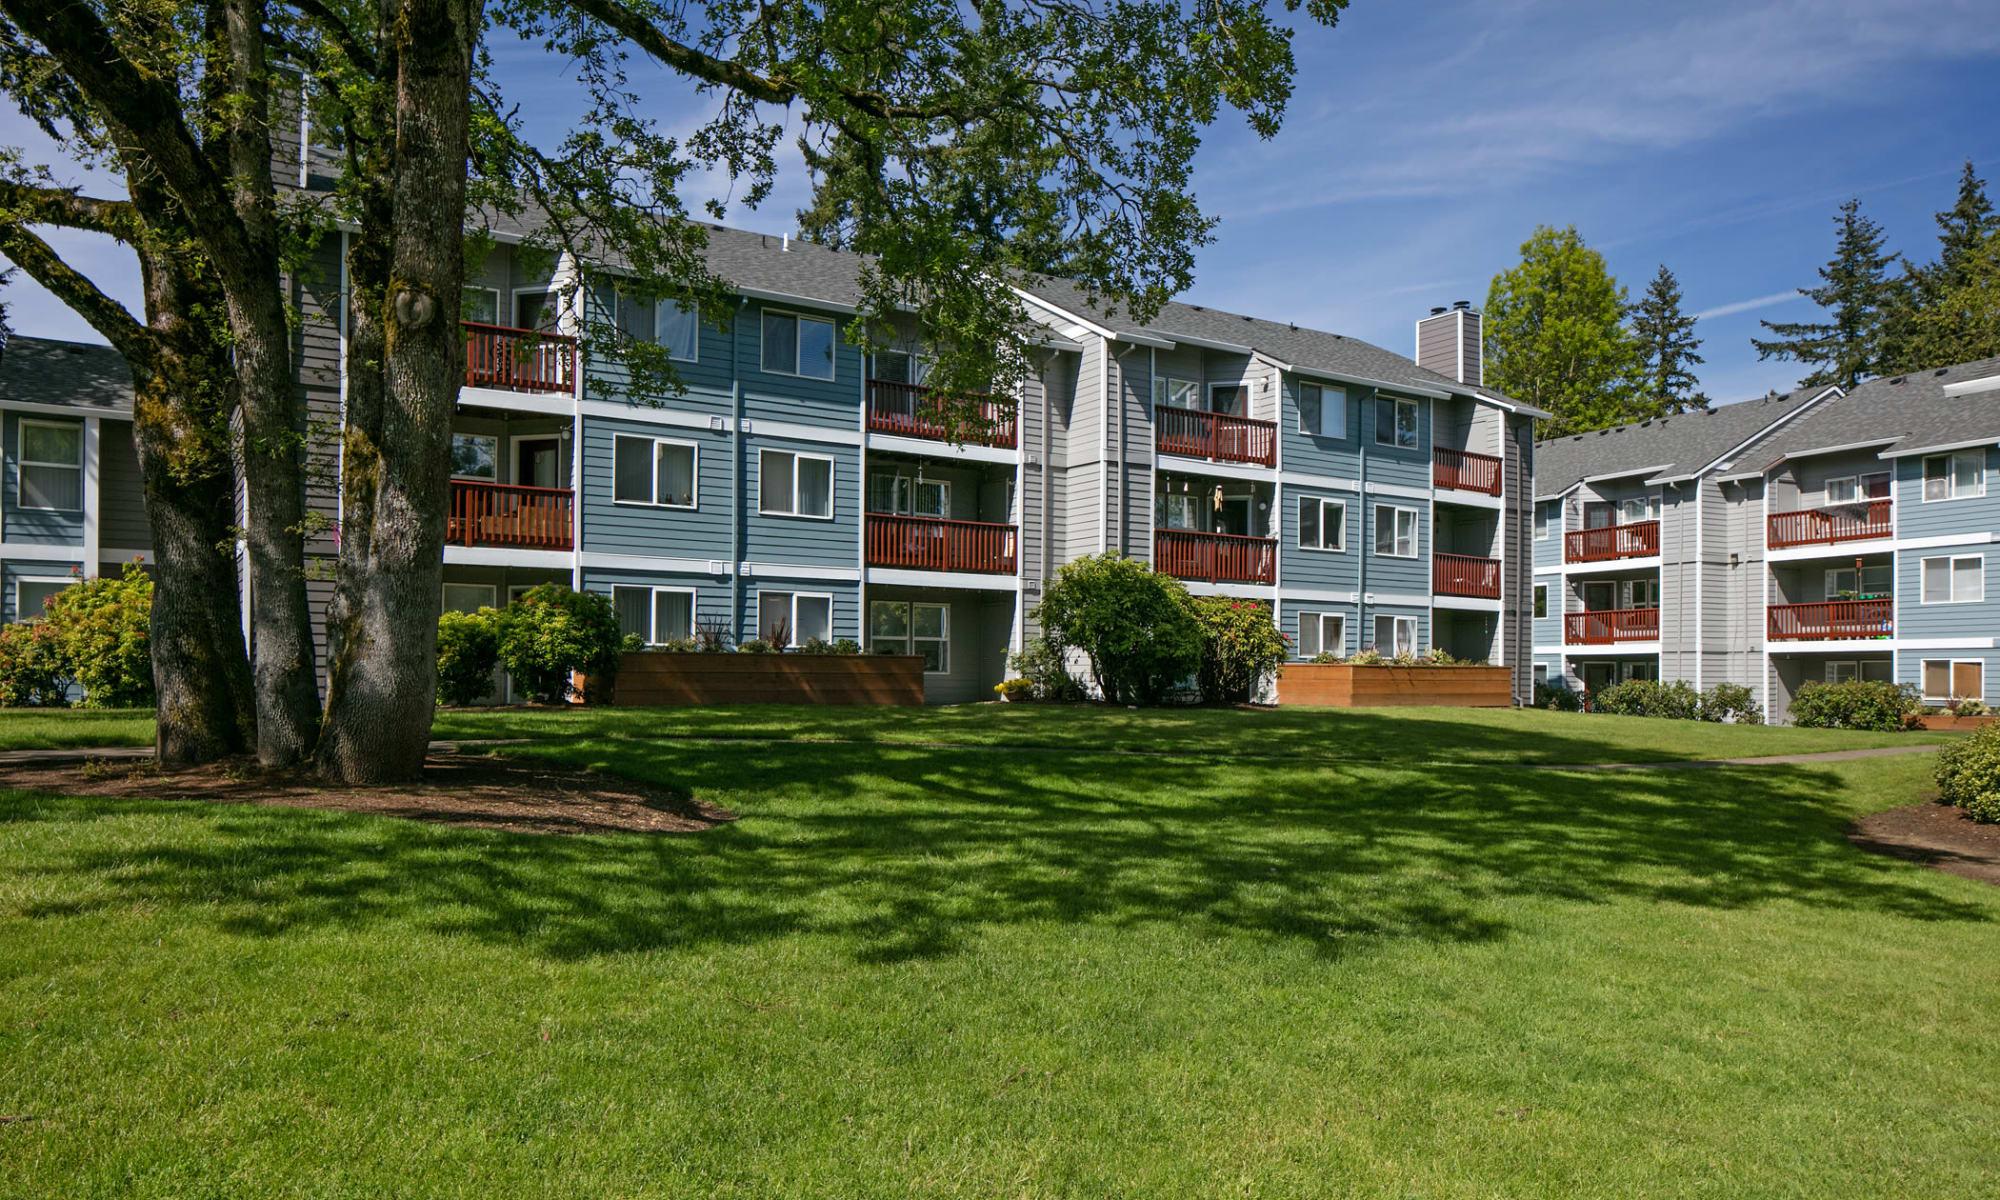 Apartments at Heatherbrae Commons in Milwaukie, Oregon